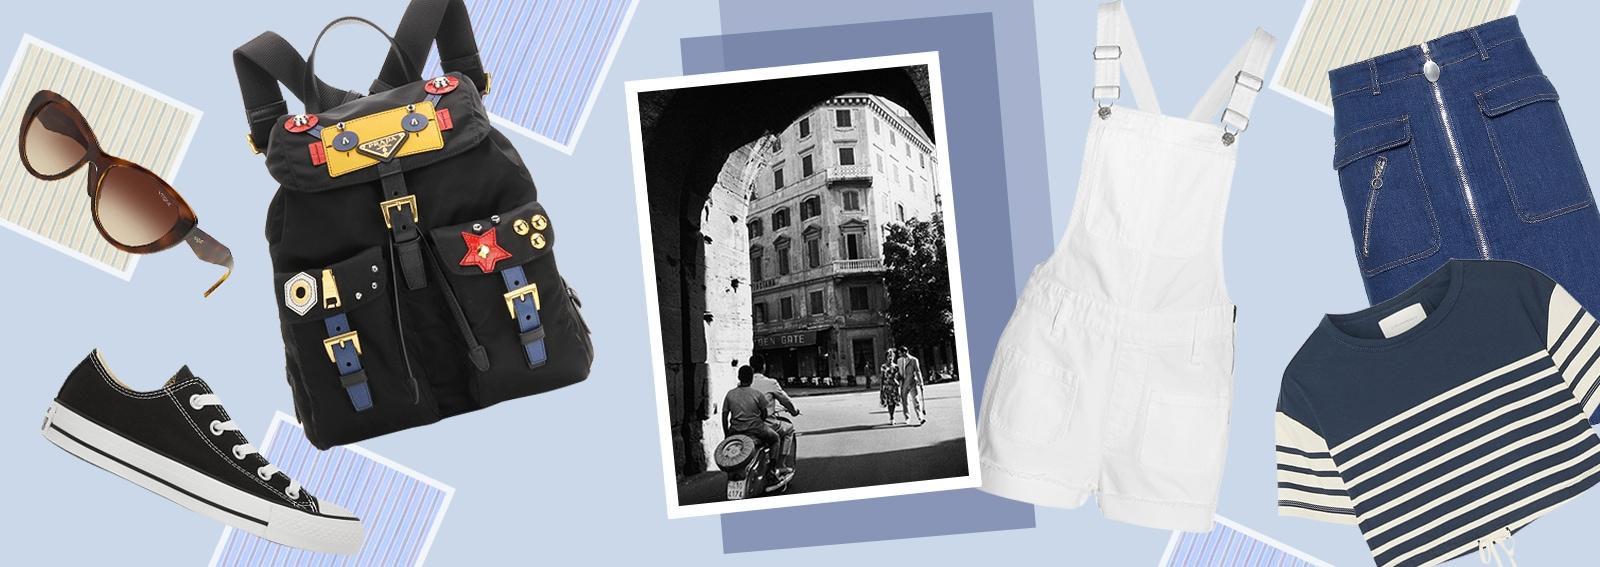 cover valigia perfetta città 2016 desktop